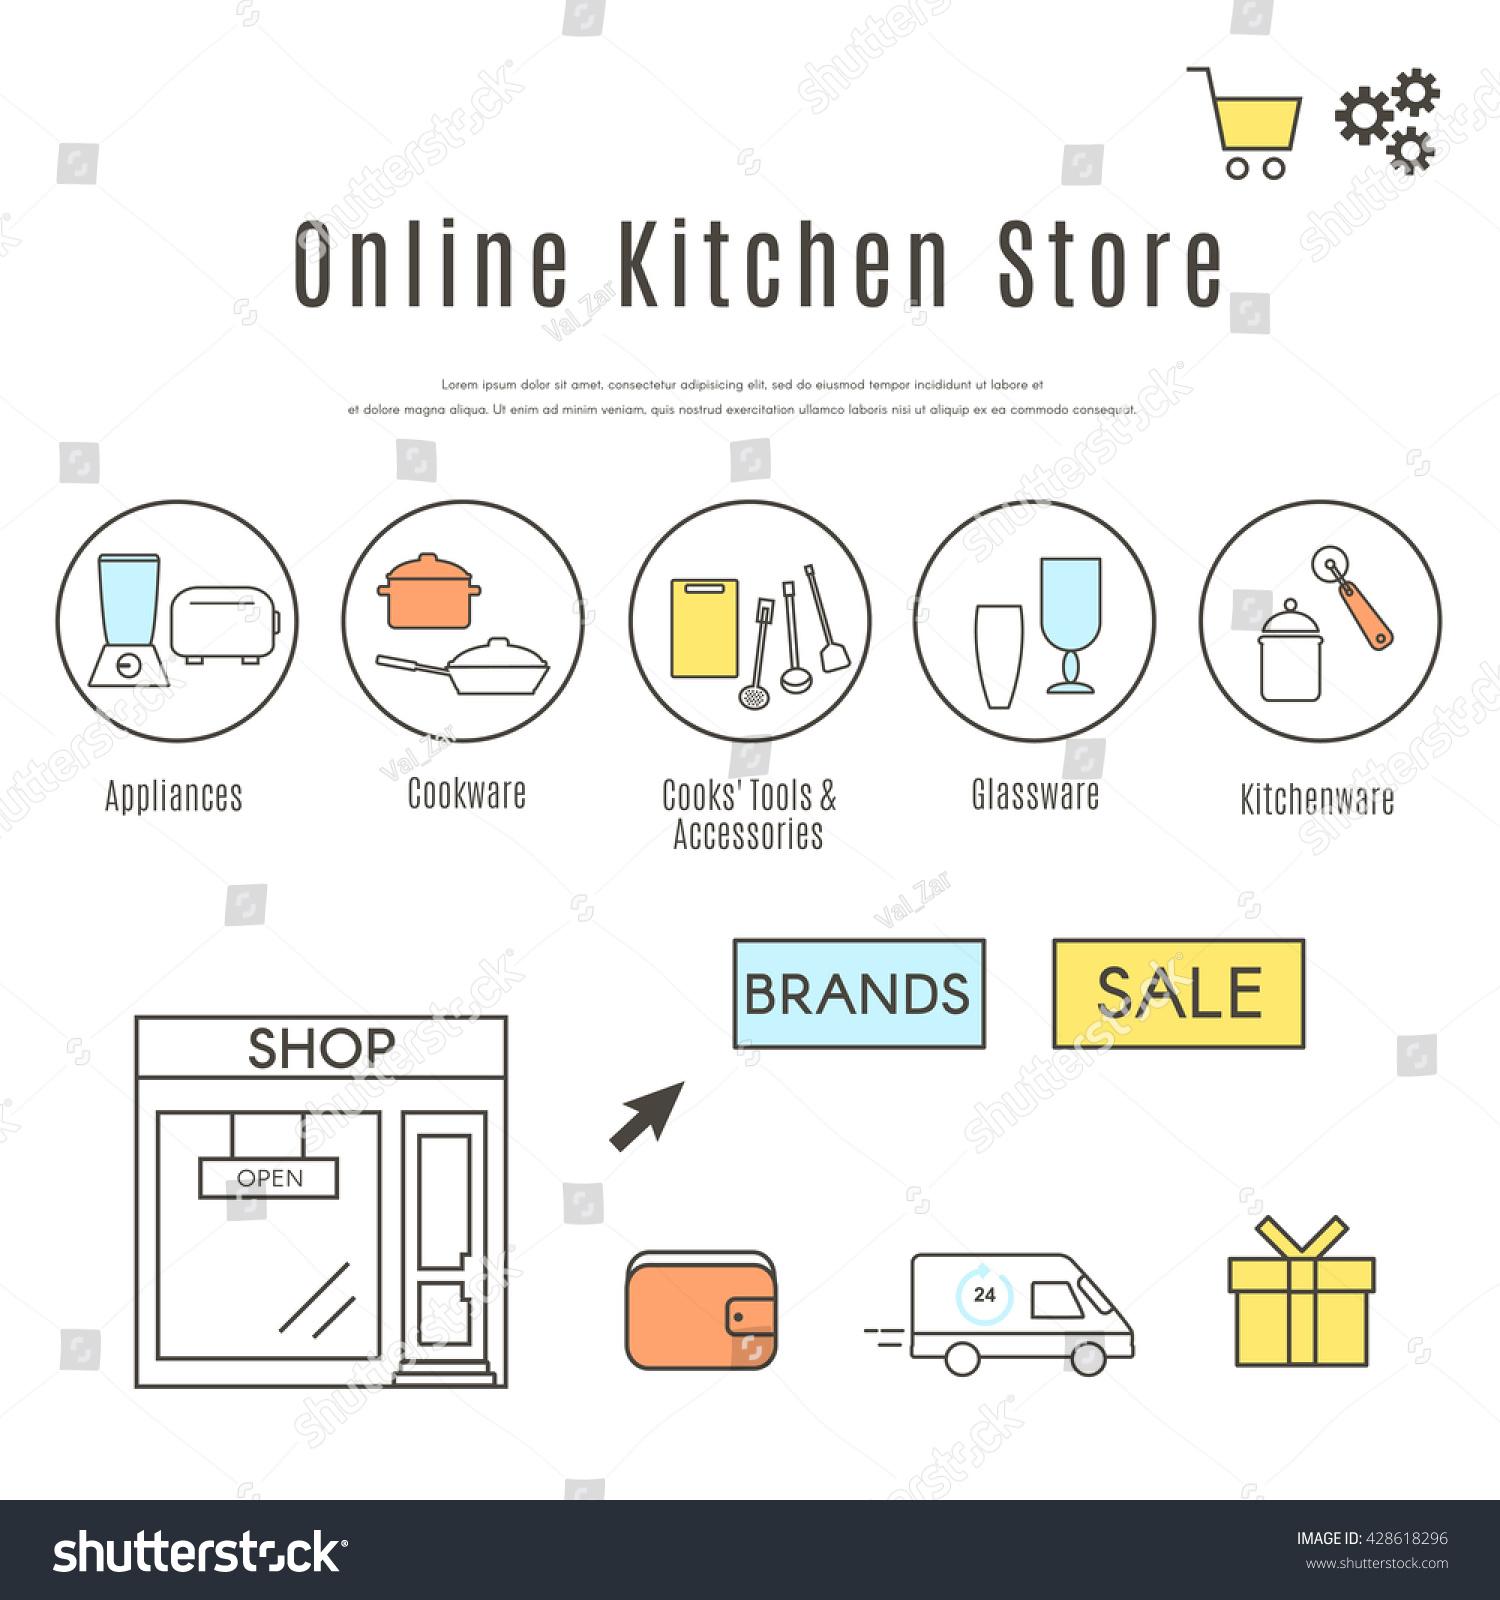 Online Kitchen Store Web Design Template Stock Vector